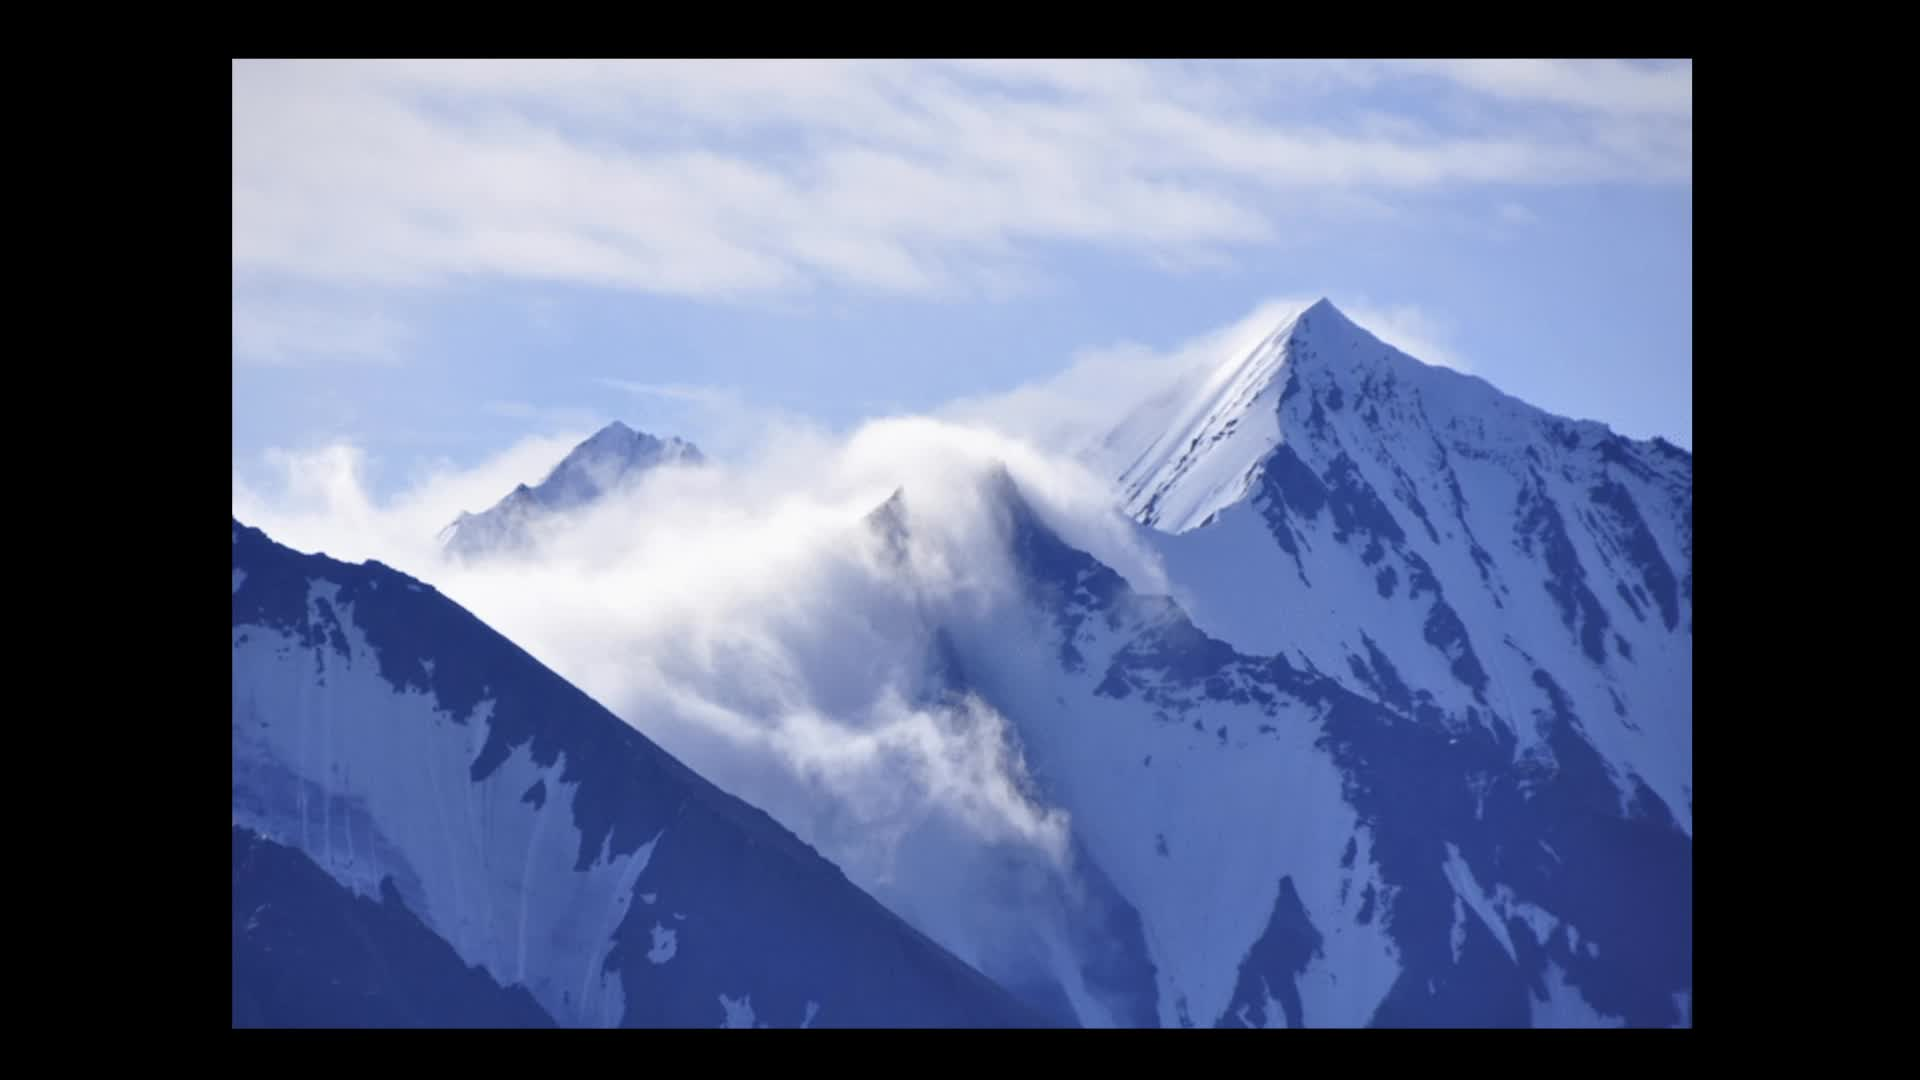 Mountain Clouds v1 GIFs